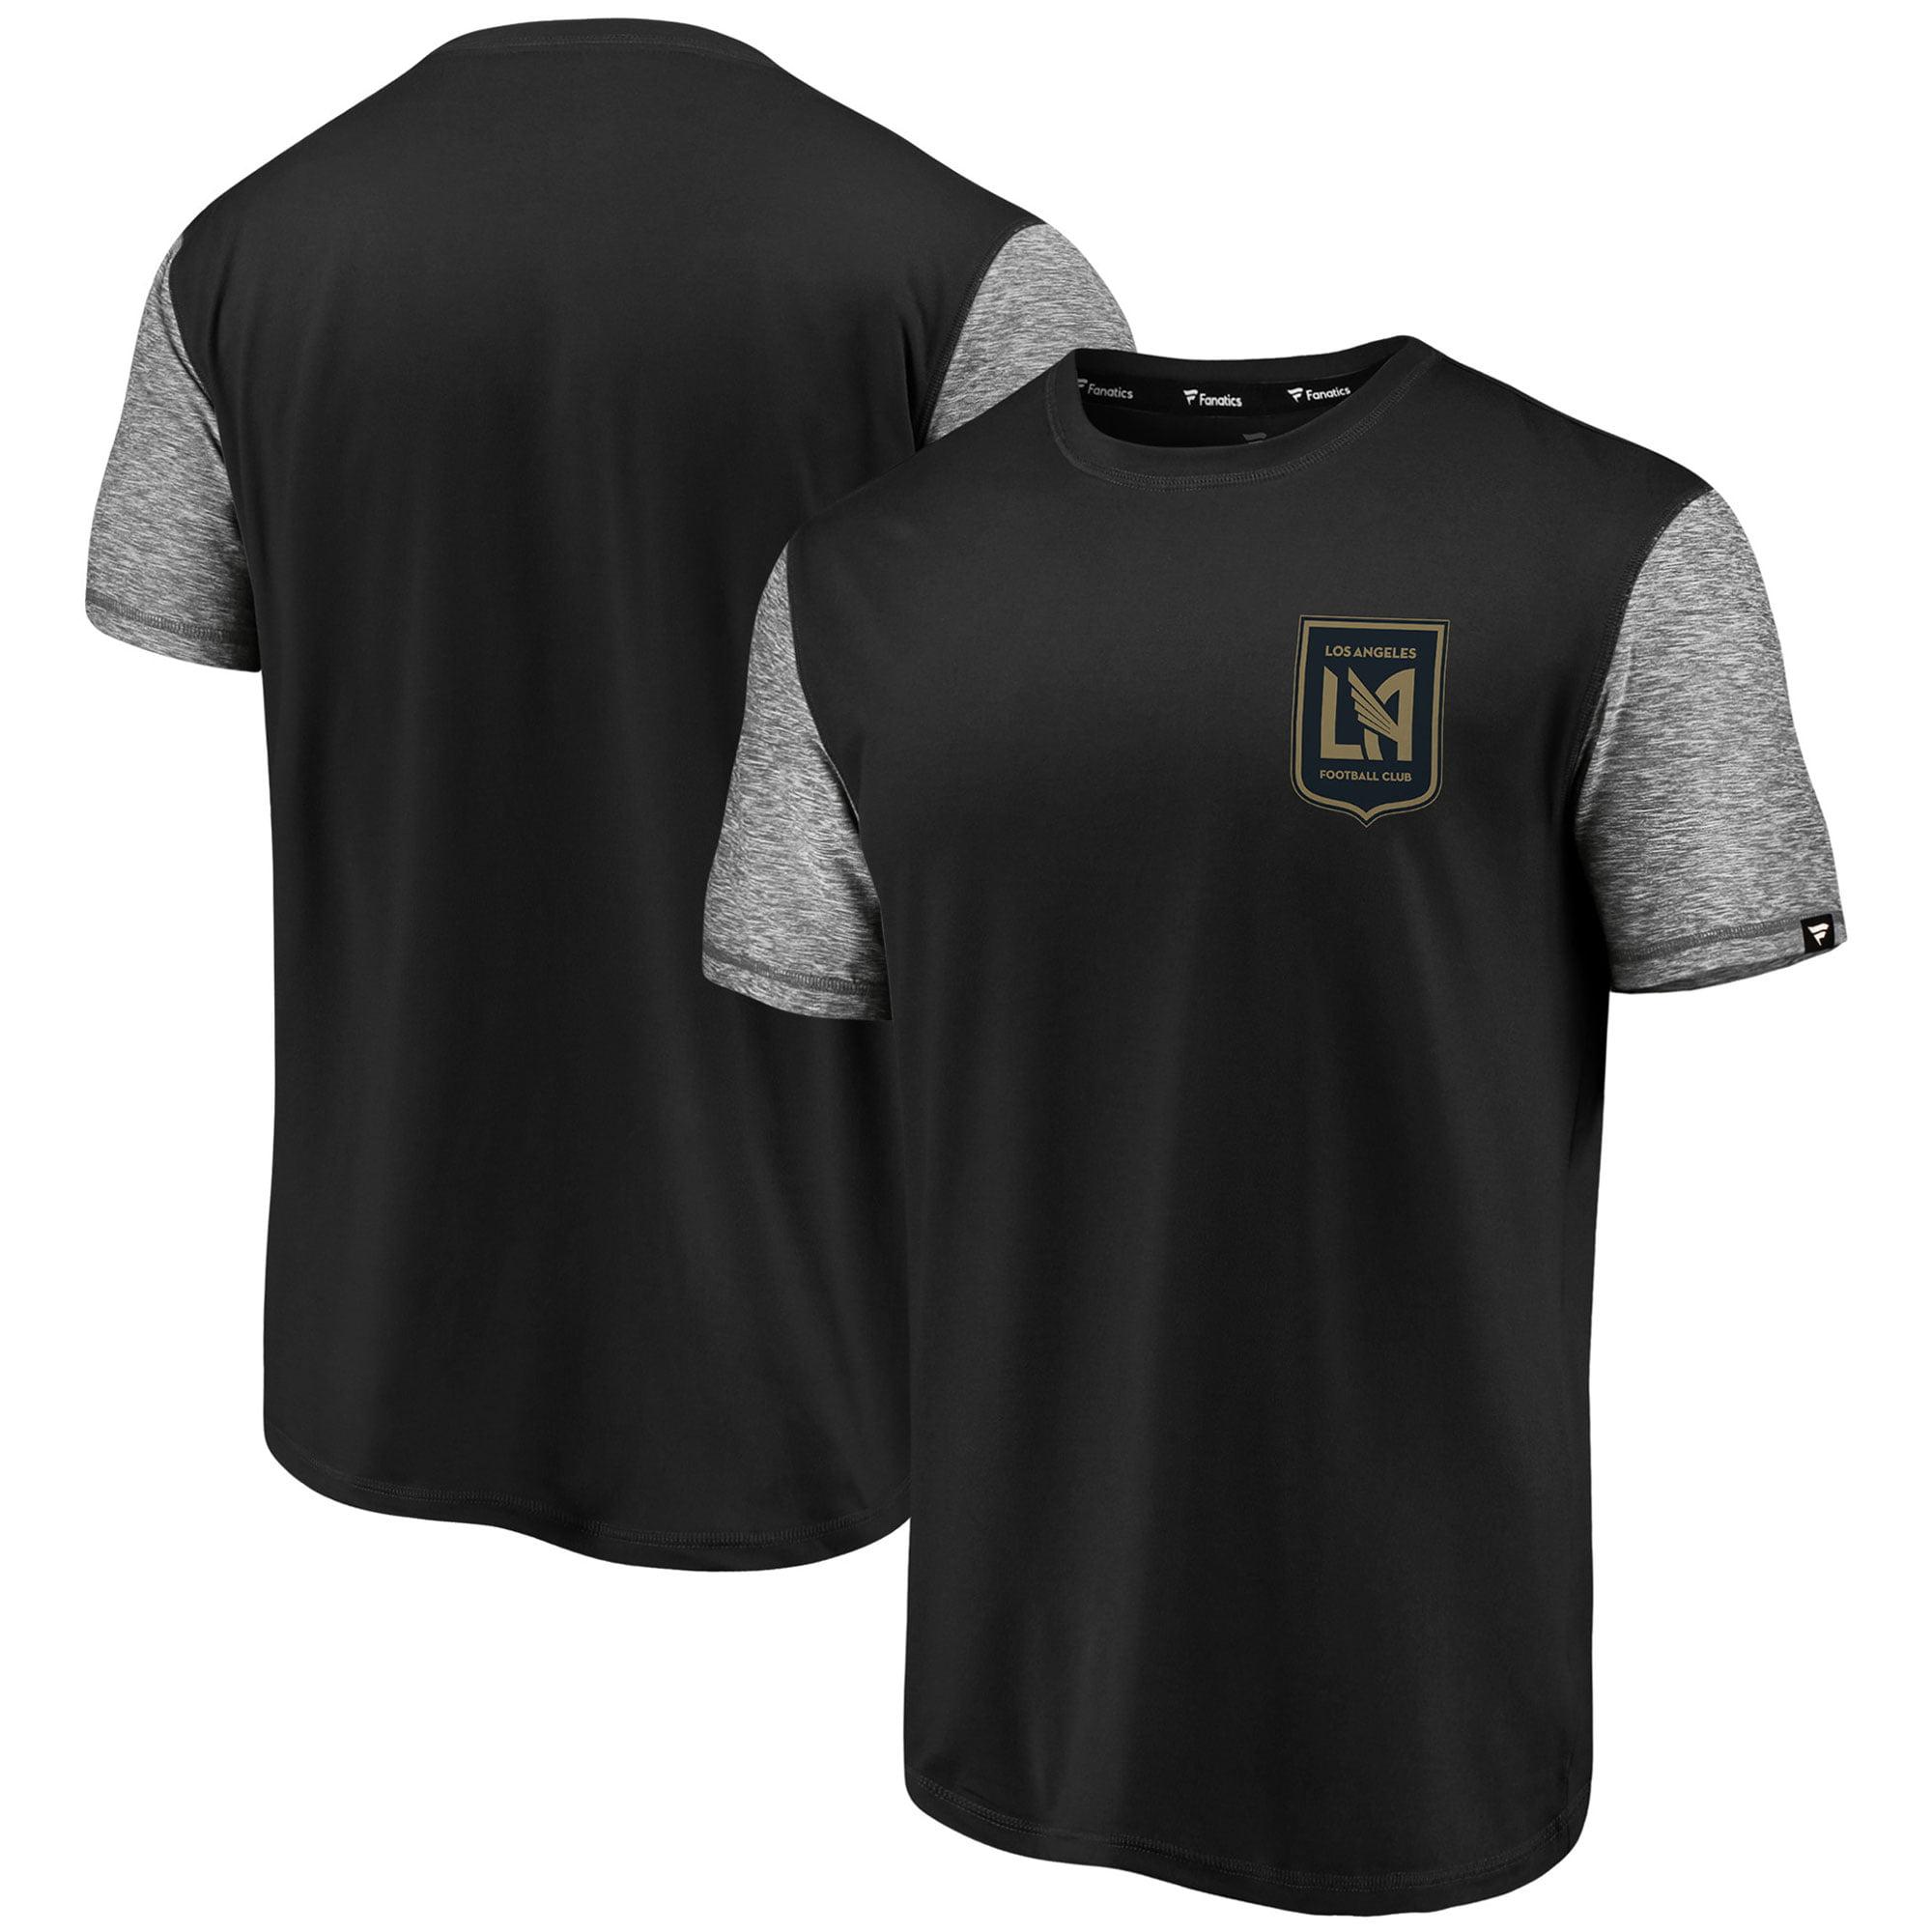 size 40 5a942 3b7c6 LAFC Fanatics Branded Color Blast T-Shirt - Black